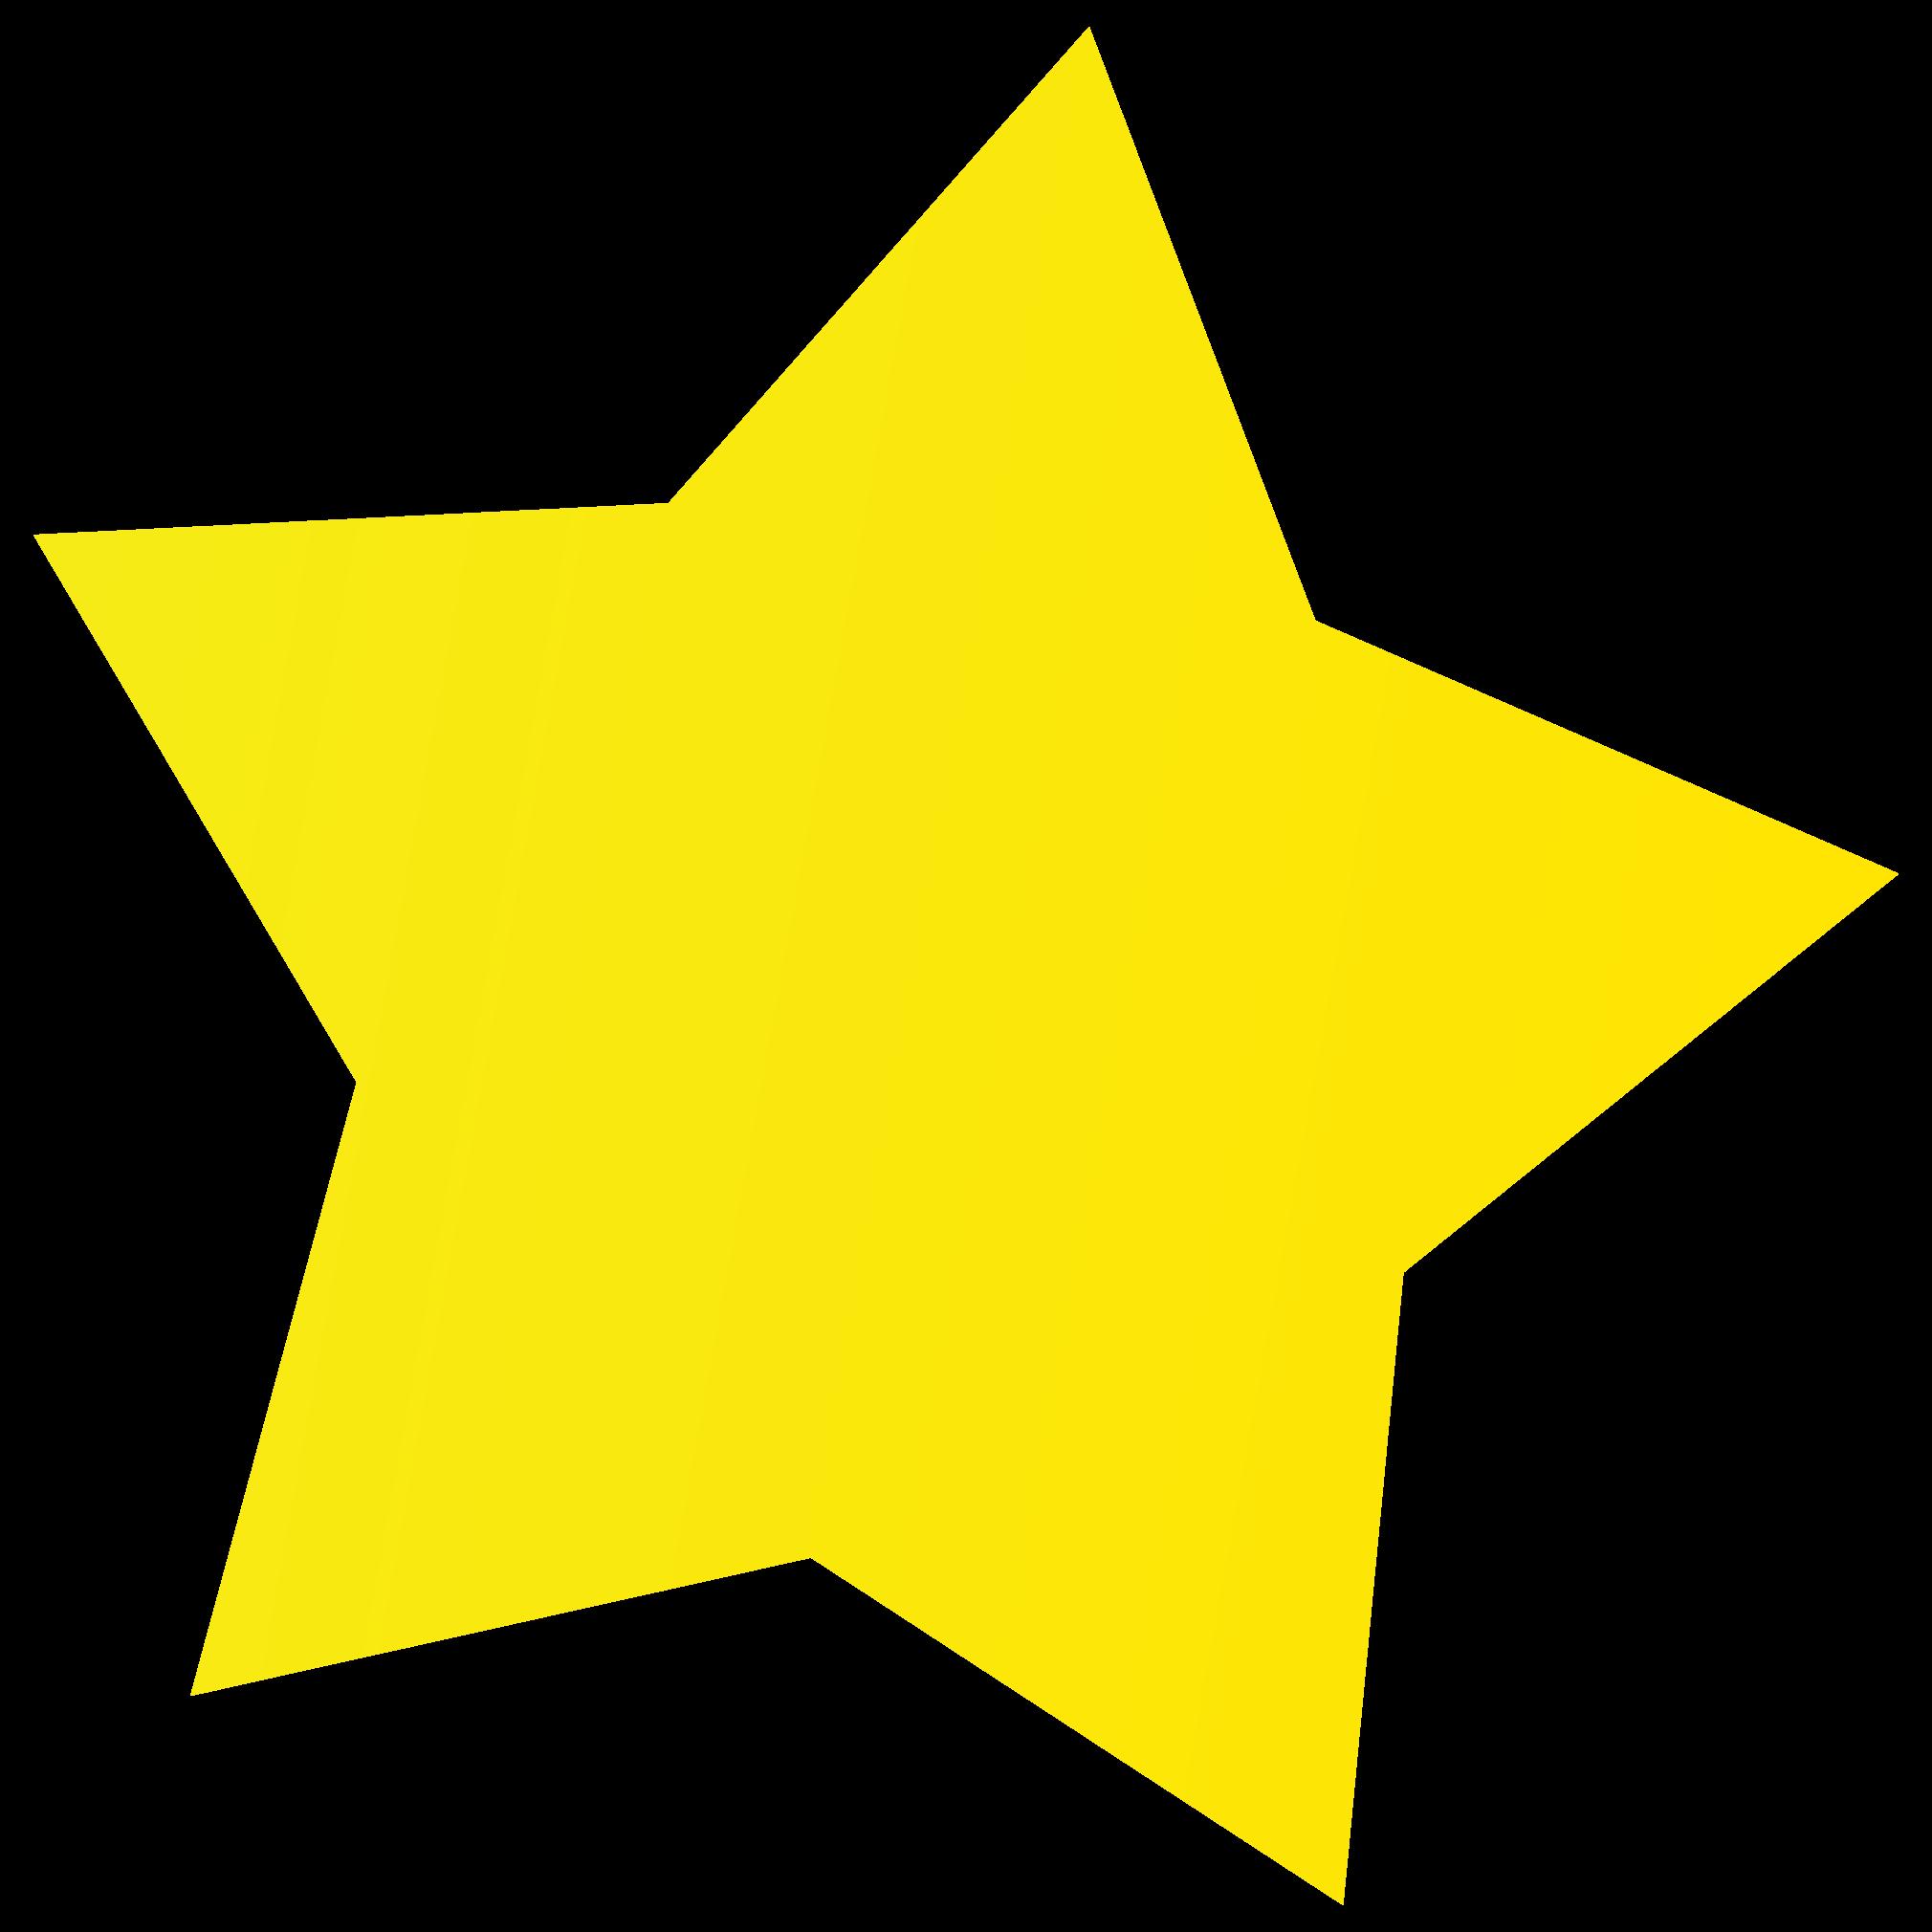 Star PNG Transparent Images.